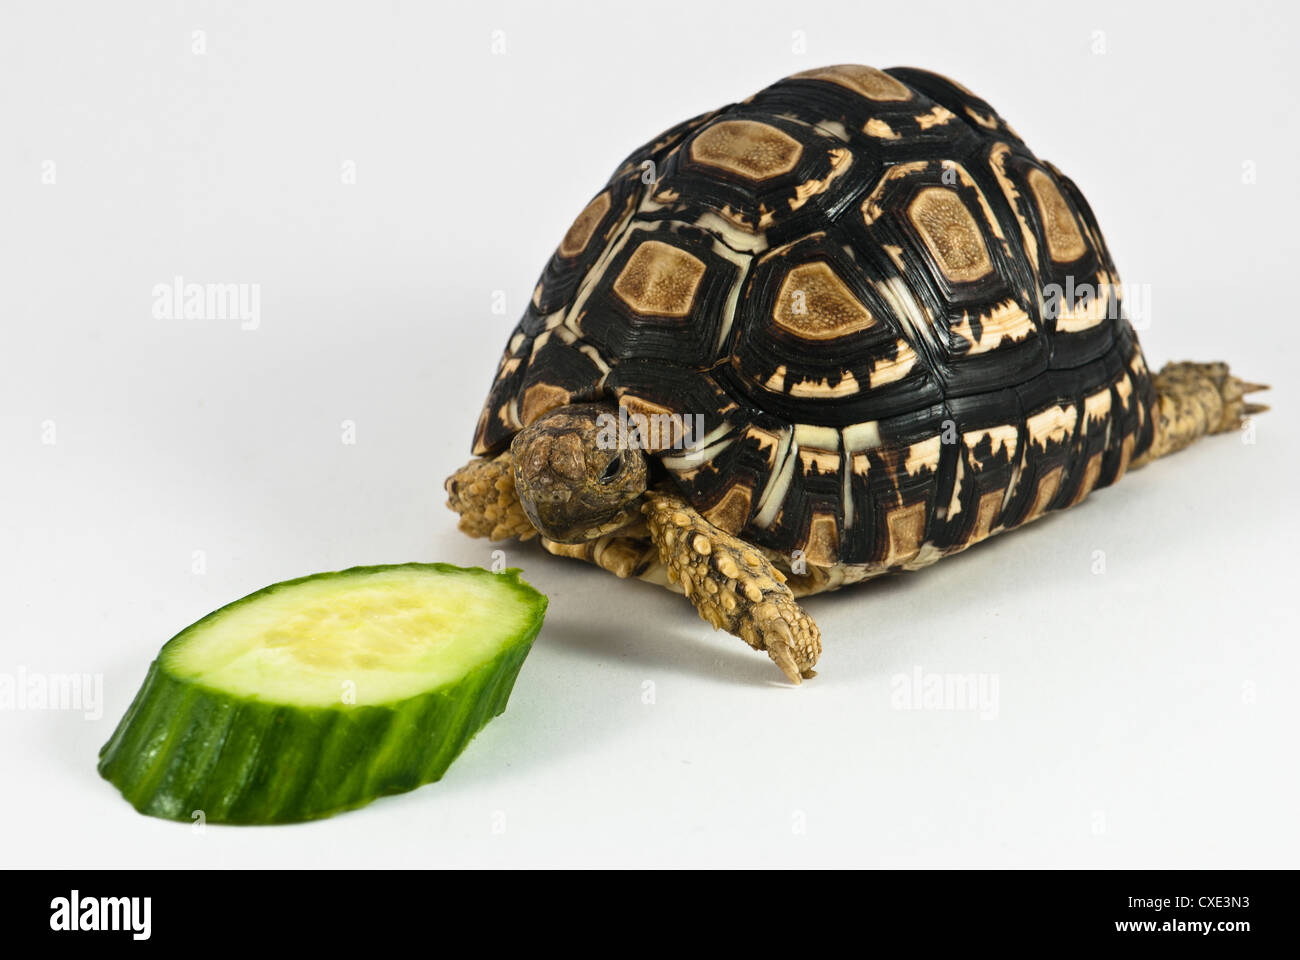 Leopard Tortoise (Geochelone pardalis) isolated on white background is eating cucumber - Stock Image